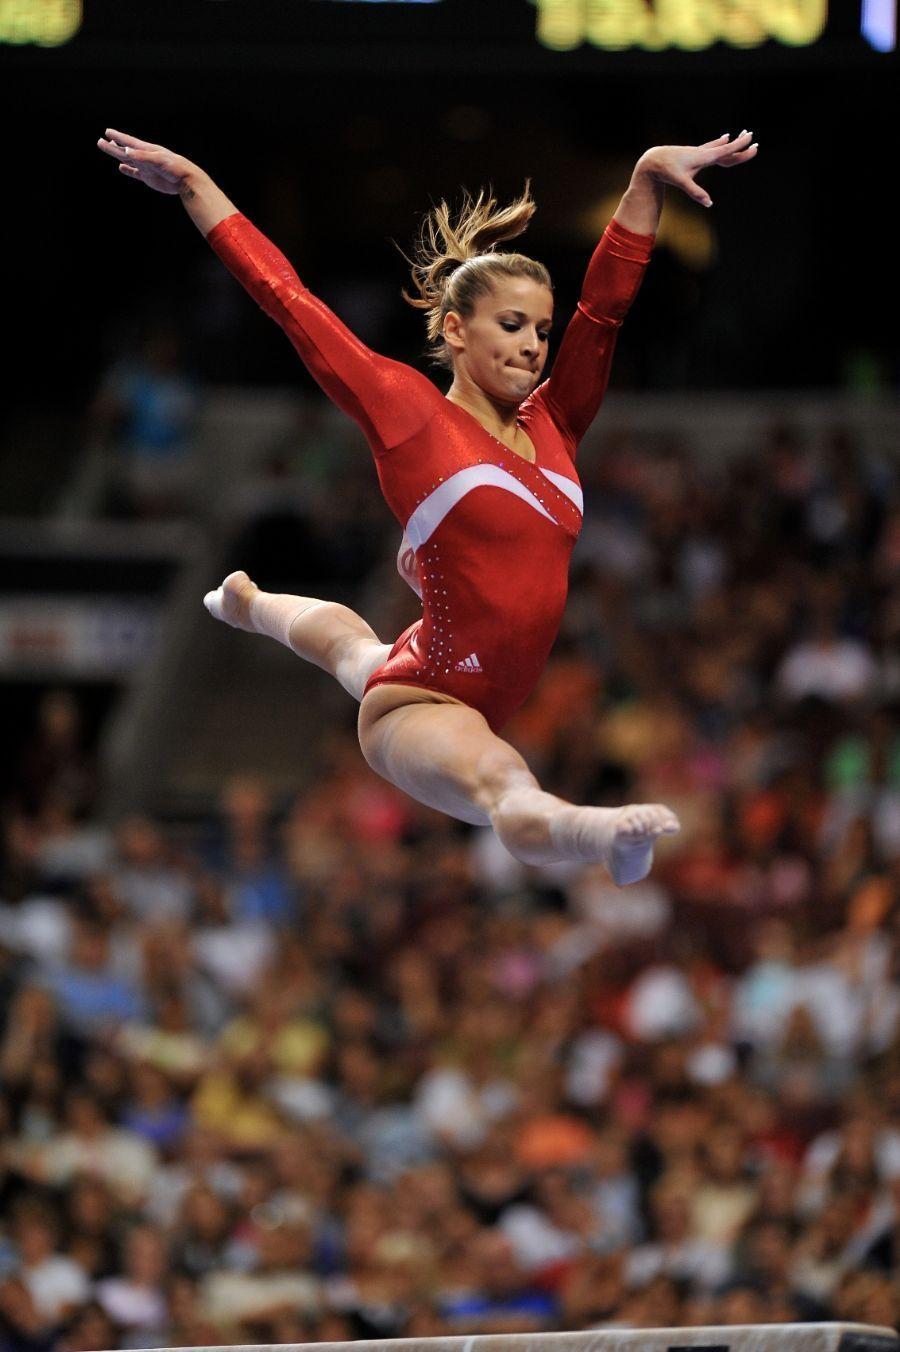 Pin by Richard Castillo on sports   Female gymnast